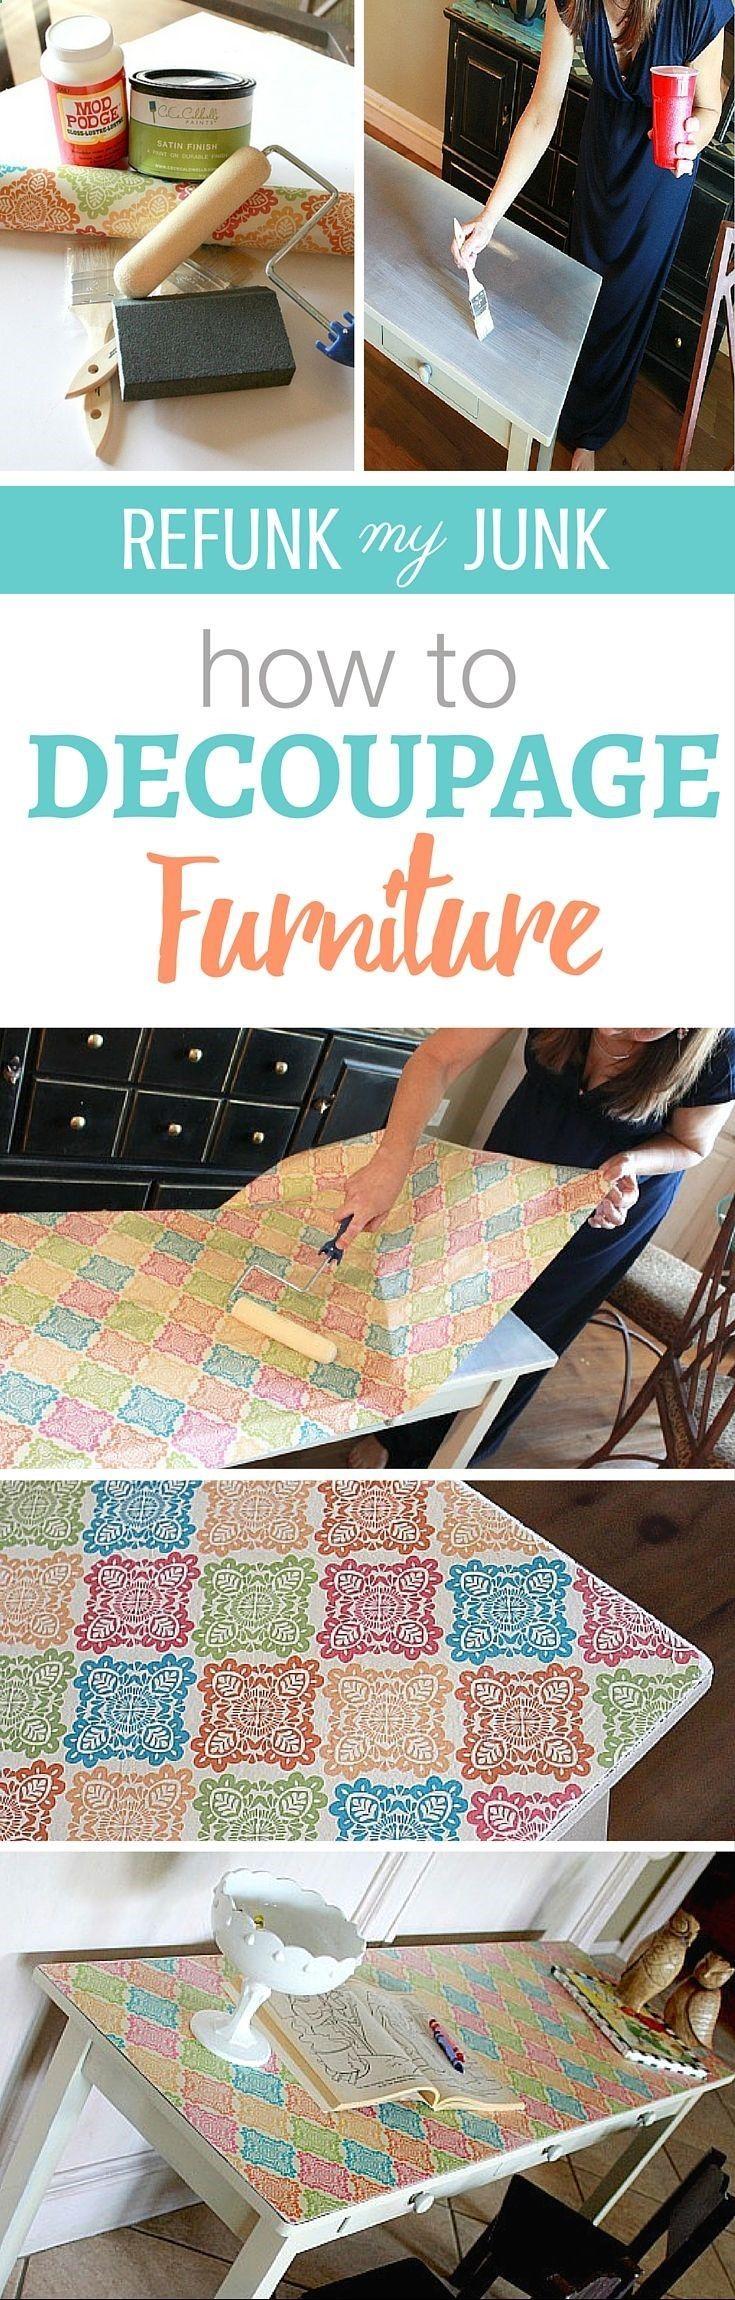 best Decoupage images on Pinterest Bricolage Decoupage ideas